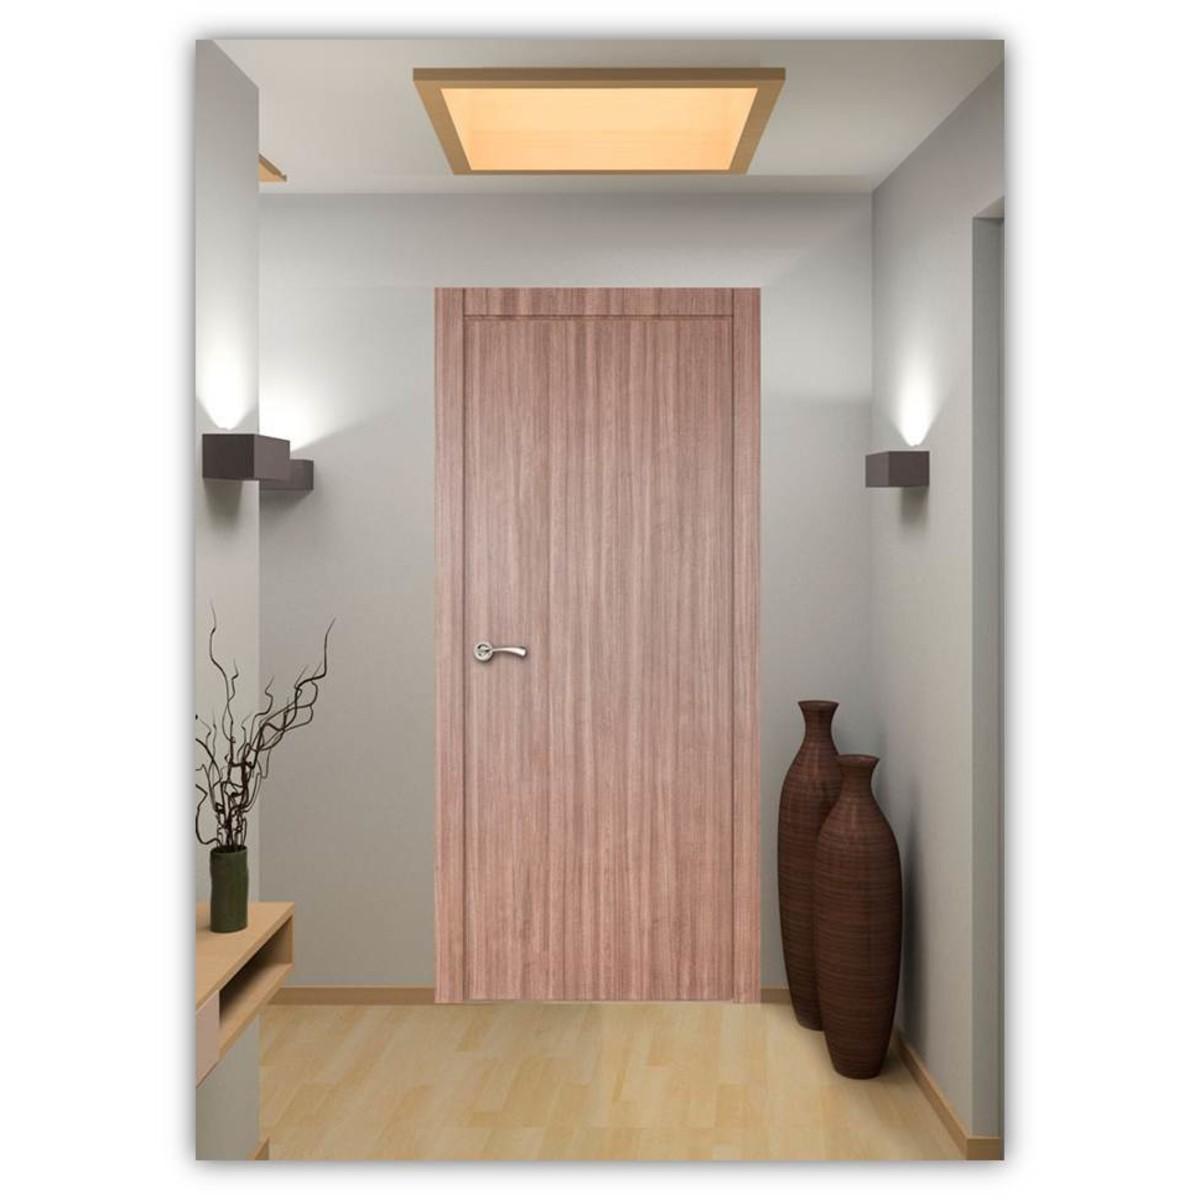 Дверь Межкомнатная Глухая Селена 80x200 Цвет Орех